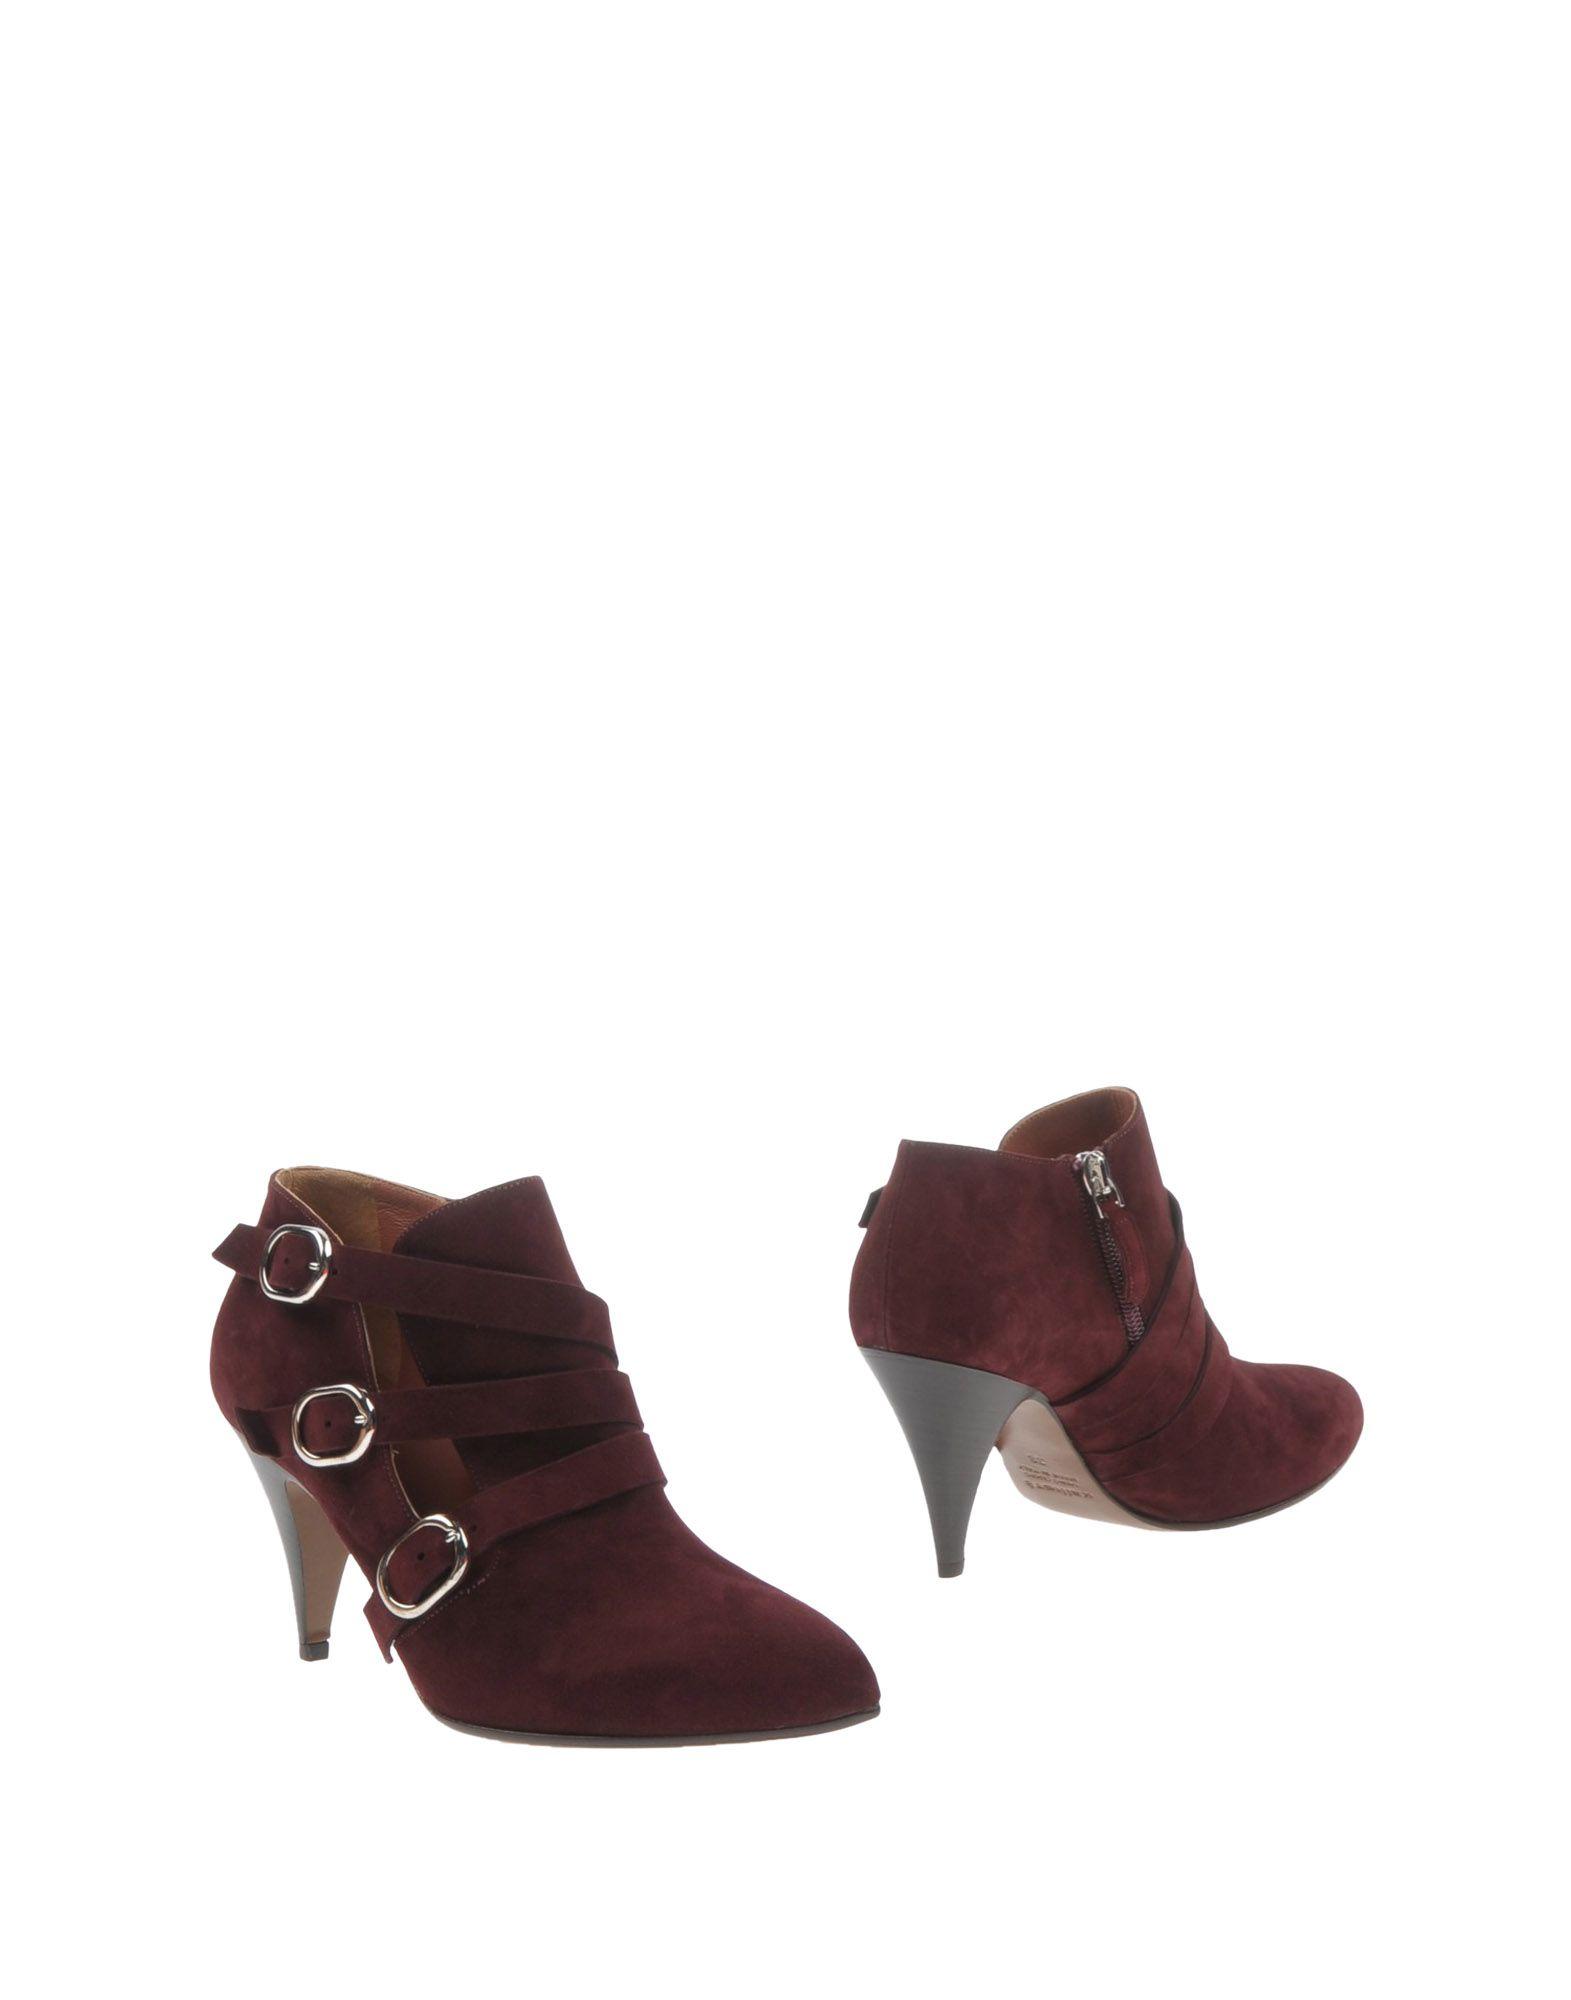 Kallistè 11359987AB Stiefelette Damen  11359987AB Kallistè Gute Qualität beliebte Schuhe a7f8bf